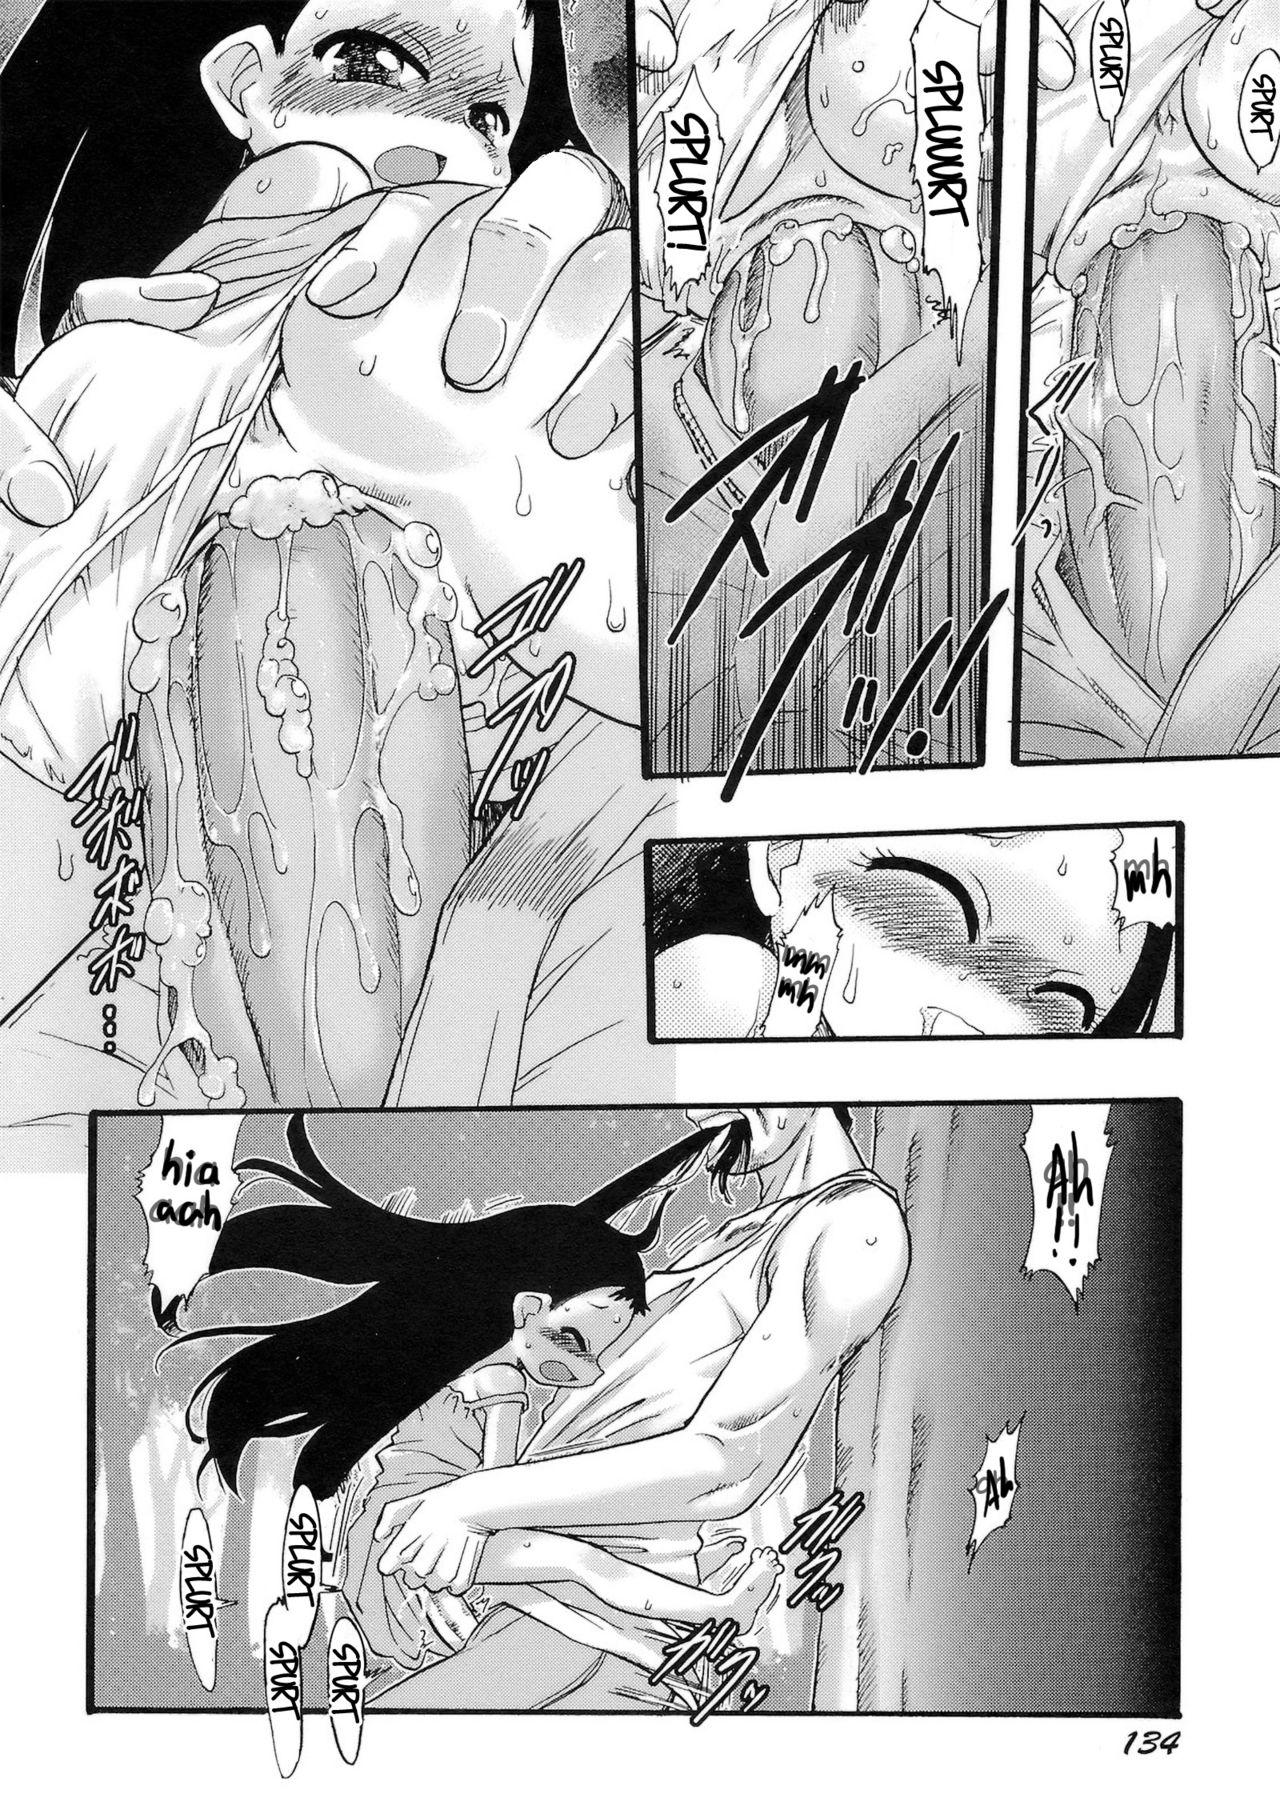 [Teruki Kuma] Osanaki Hana - Kami Haramishi Otome Ch. 1-5.5 [English] [Hige] 133